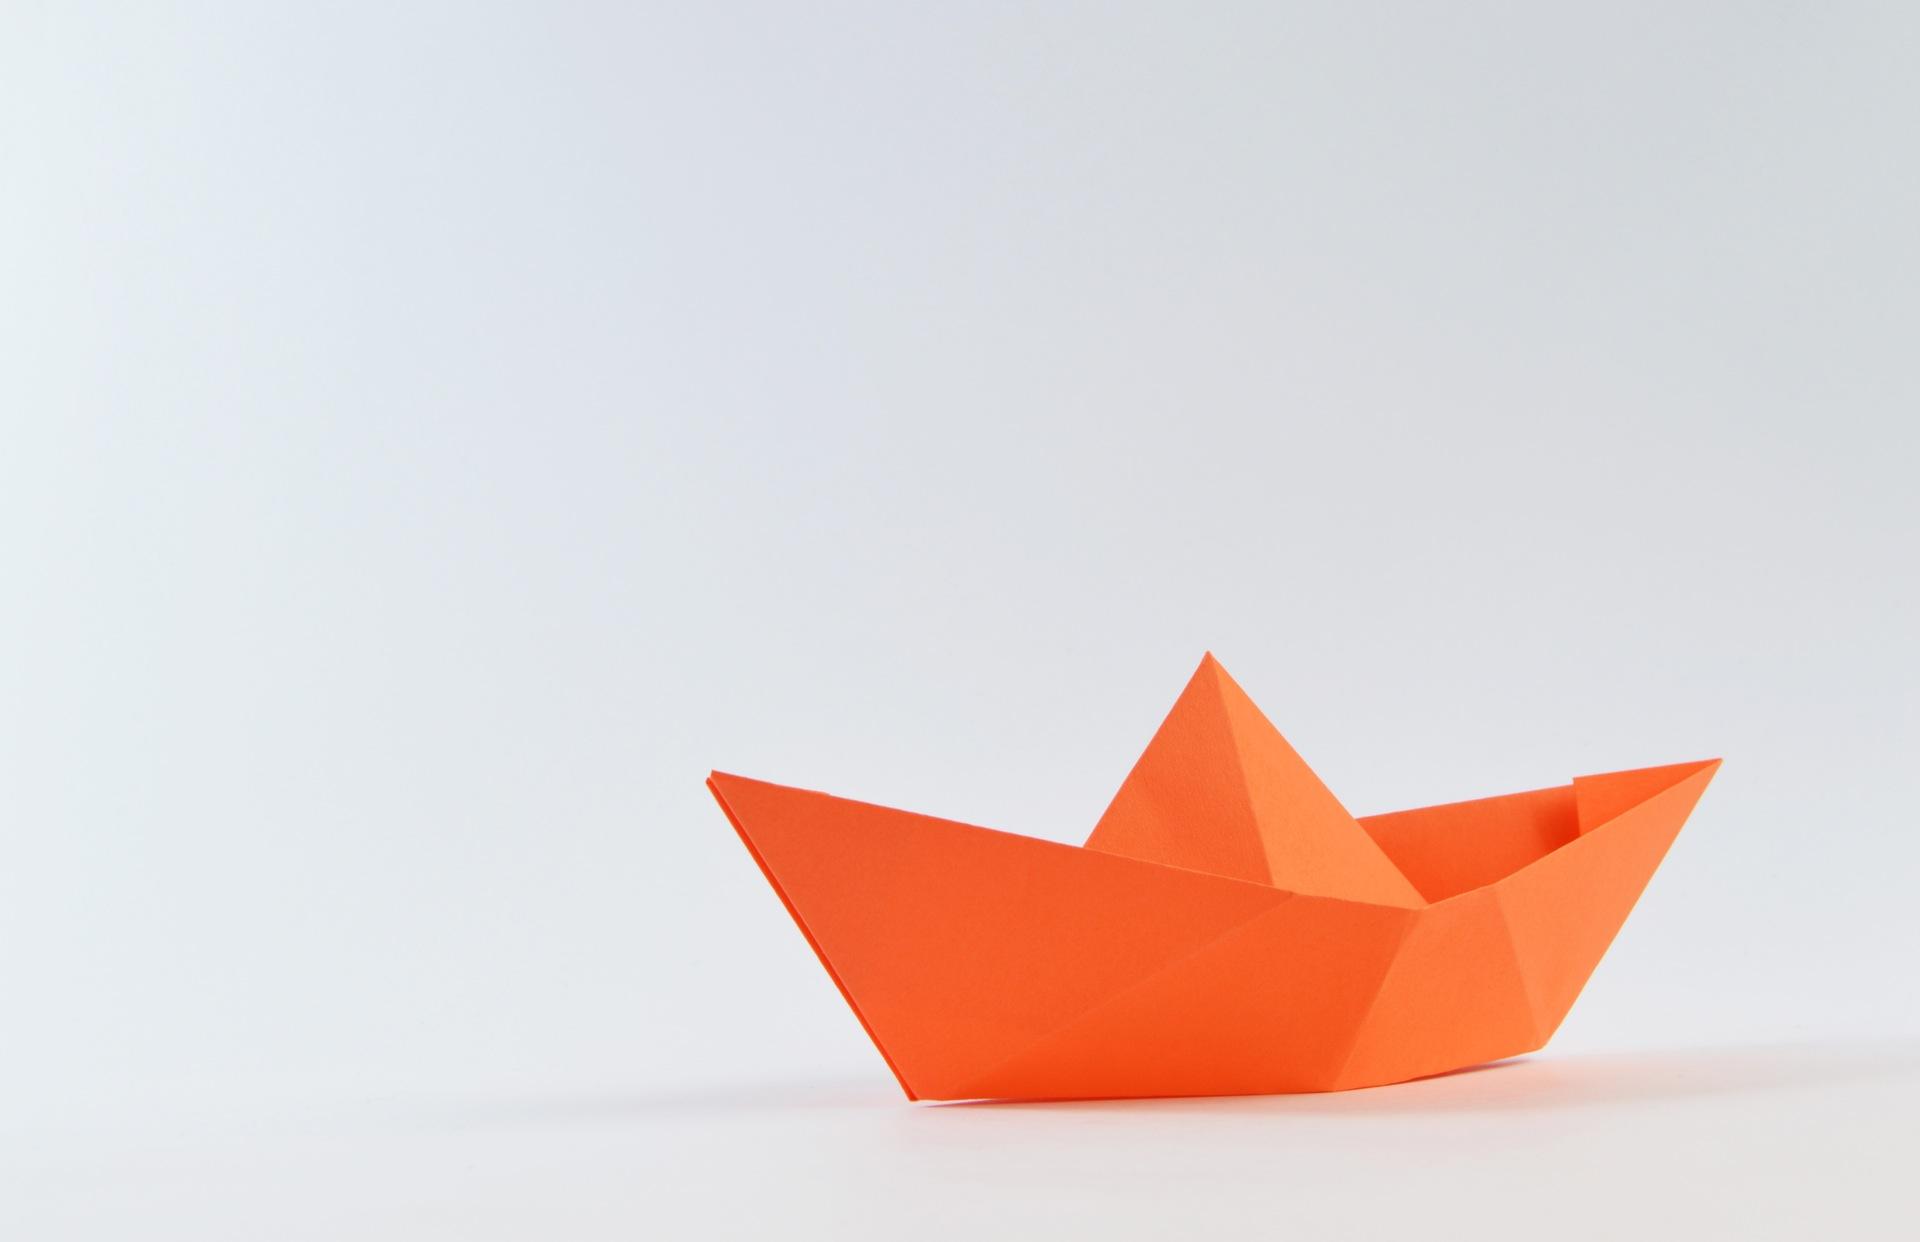 Boot, Papier, Minimalist, Origami, Orange - Wallpaper HD - Prof.-falken.com